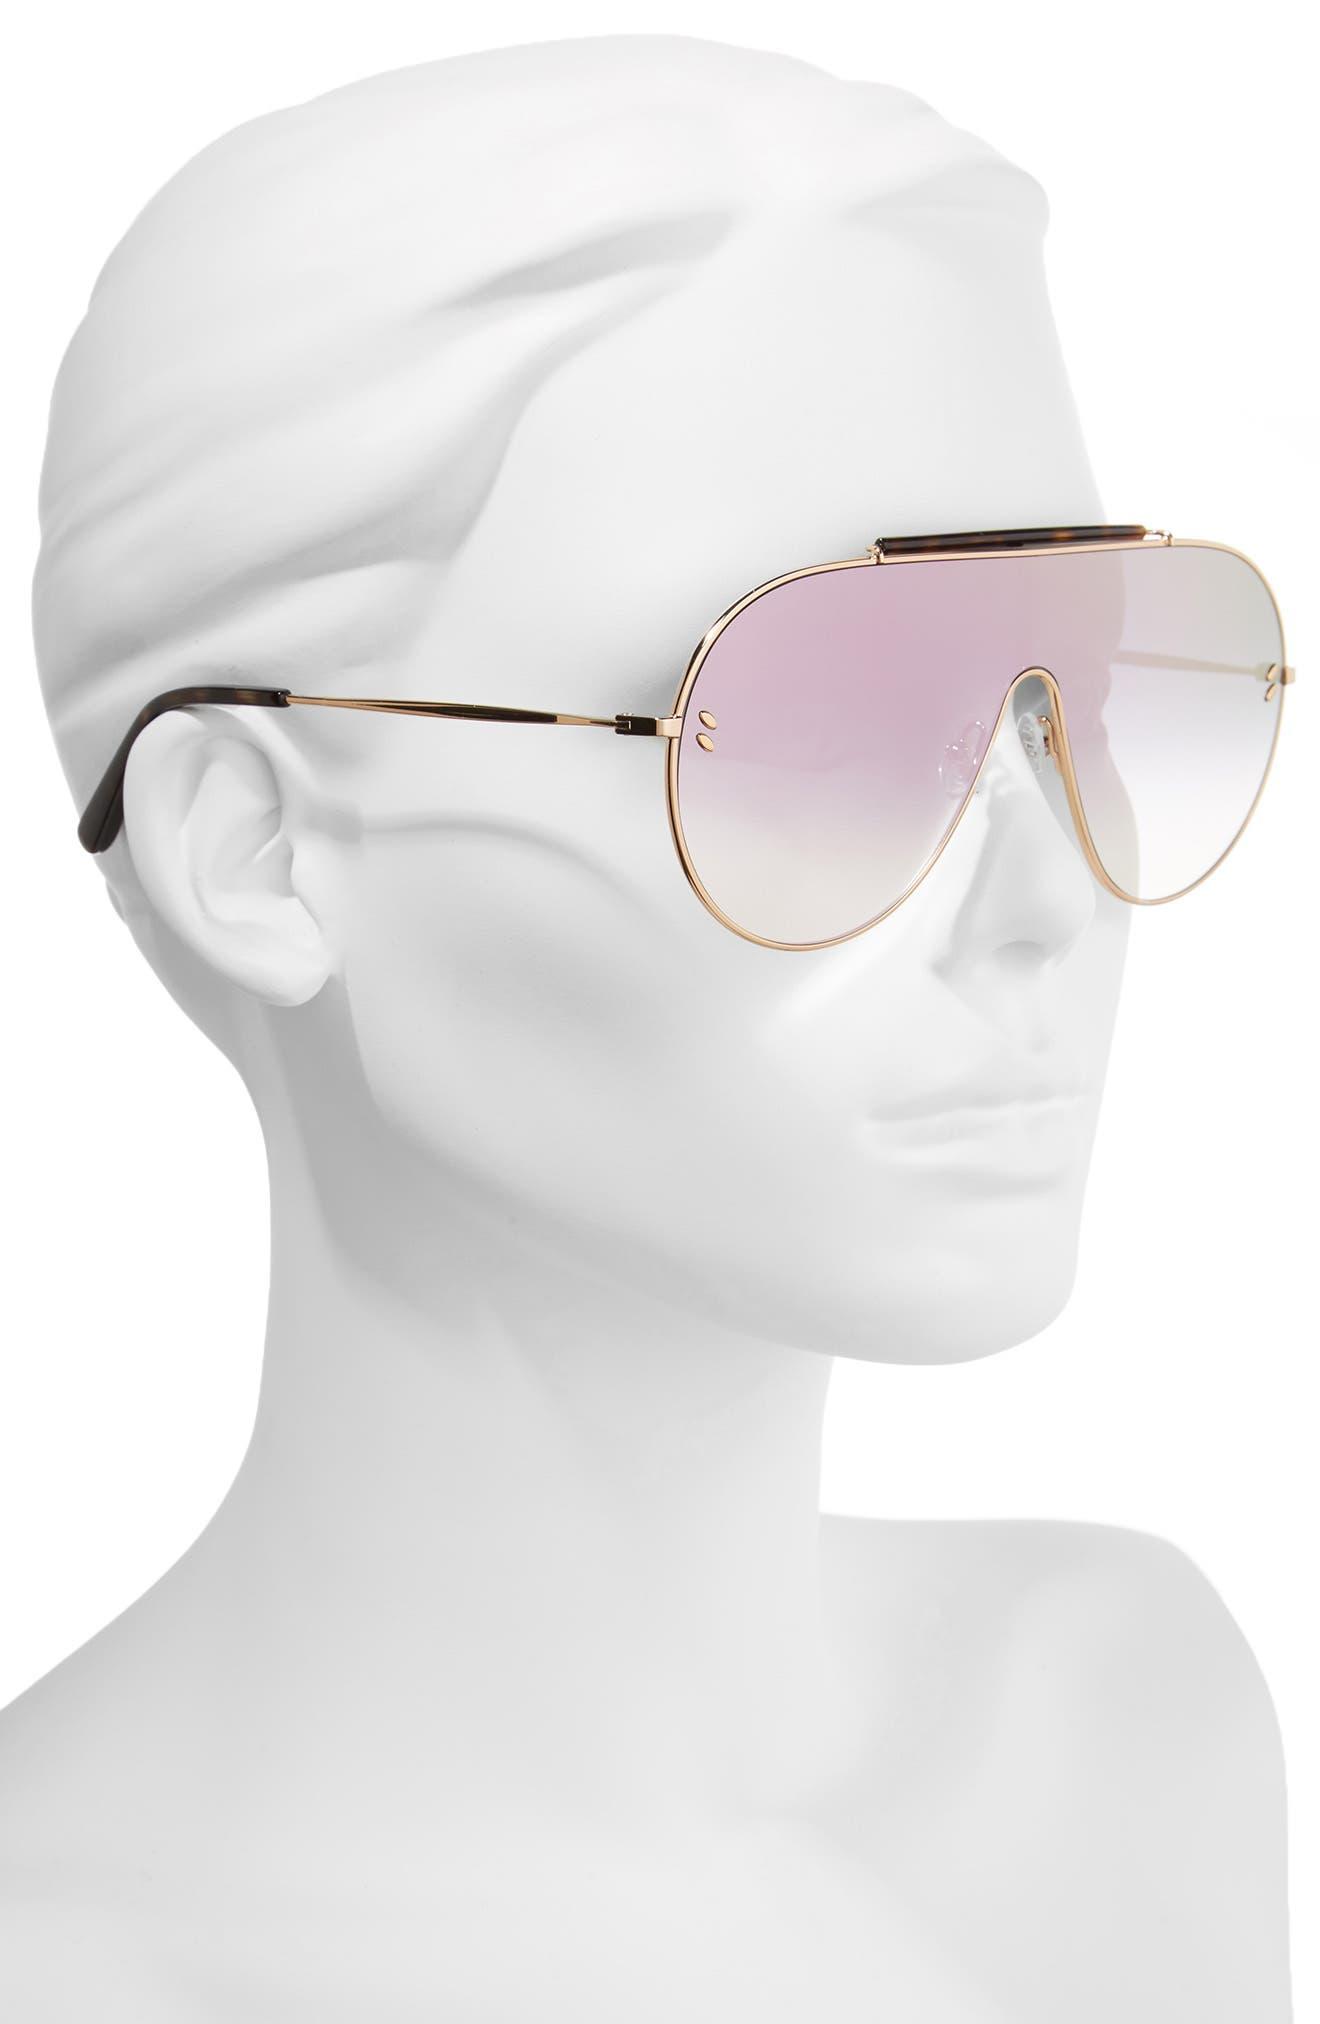 65mm Shield Sunglasses,                             Alternate thumbnail 4, color,